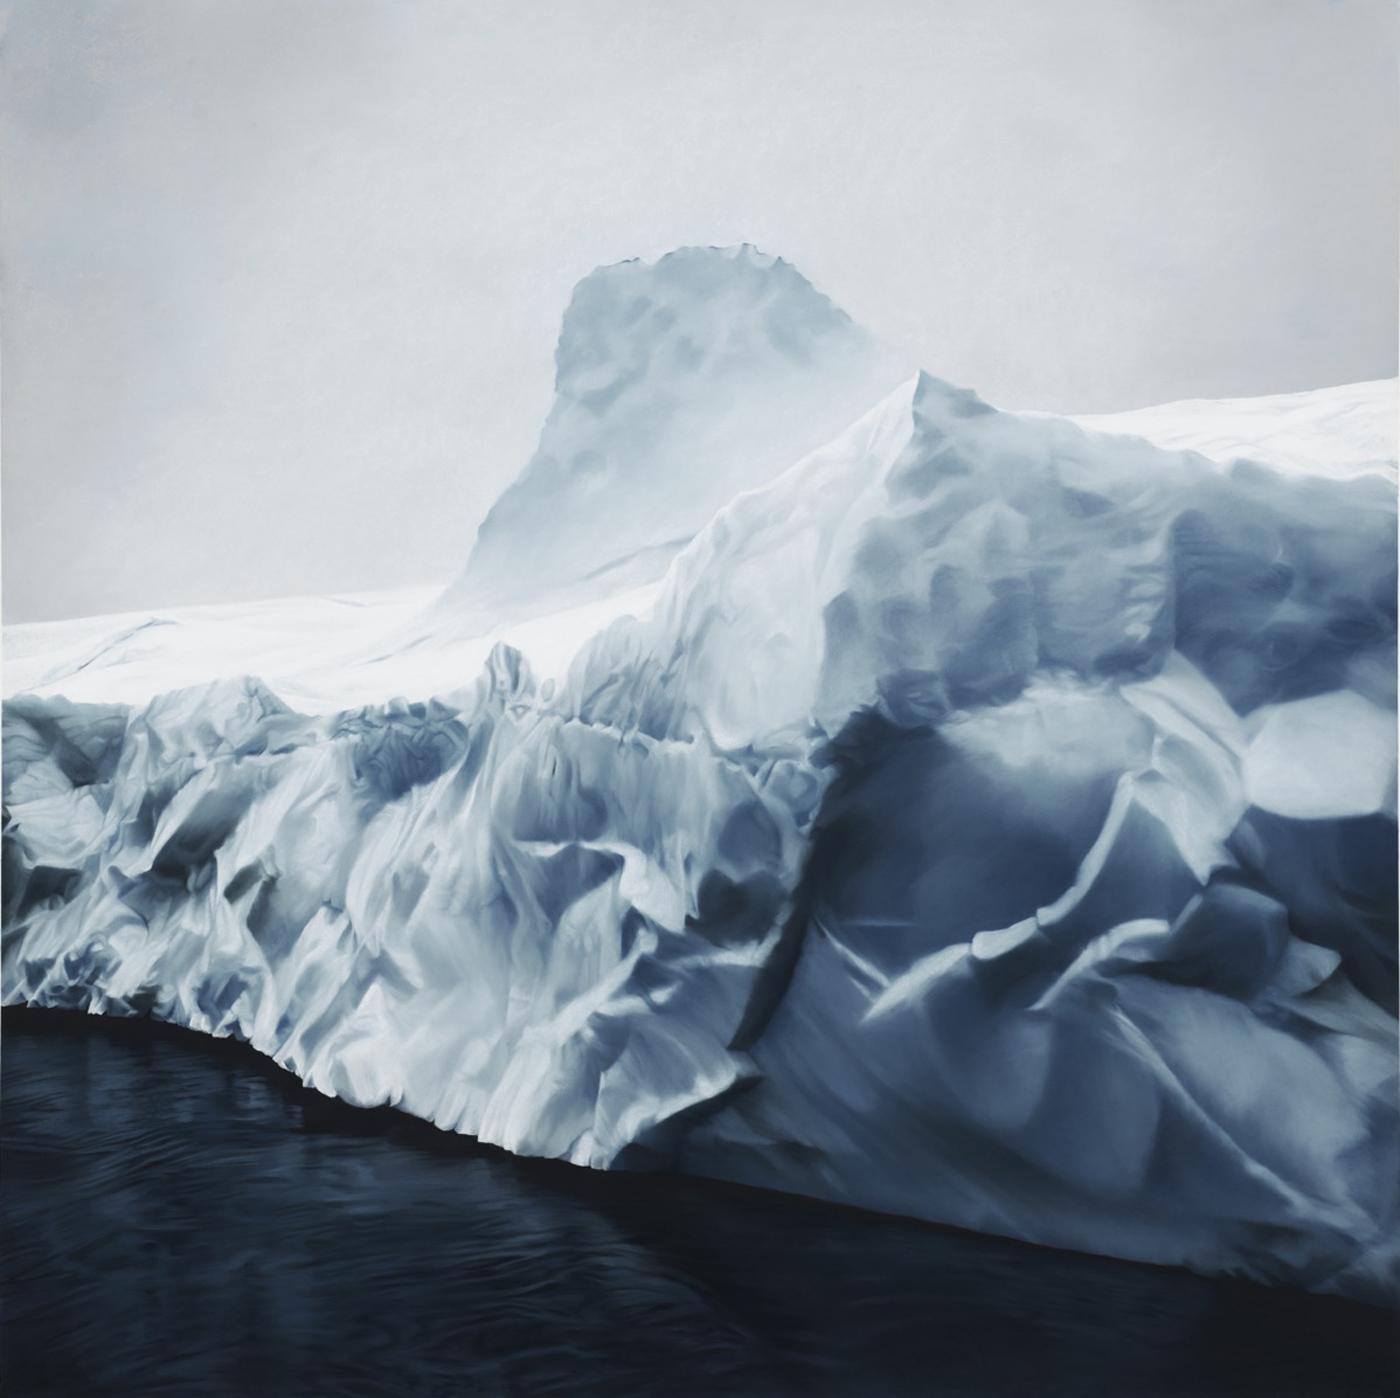 Greenland no.72, 60x60: Image courtesy of Zaria Forman